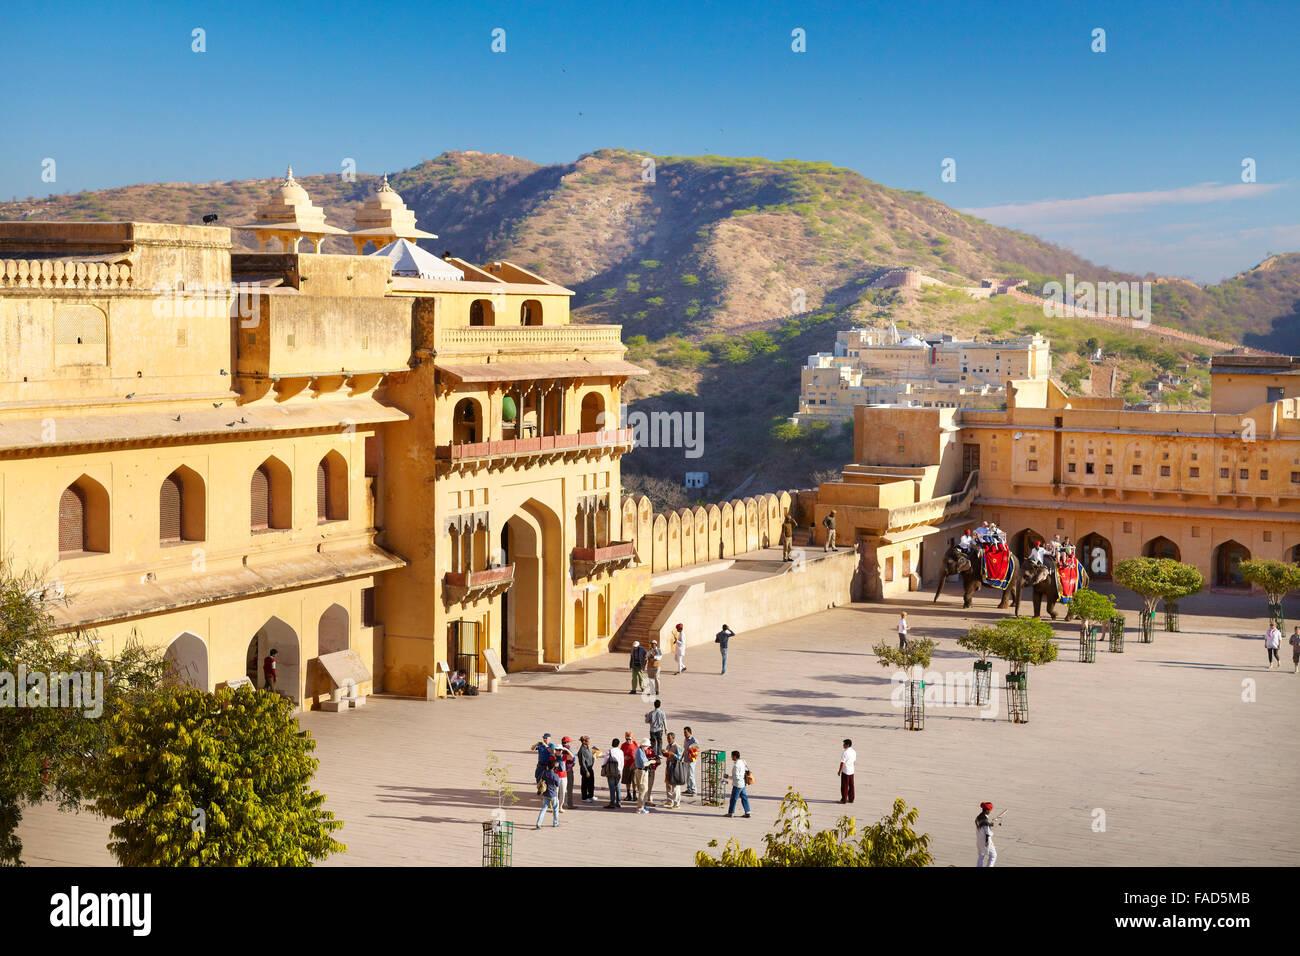 Vista del patio Jaleb Chowk, el Fuerte Amber, Jaipur, India Imagen De Stock